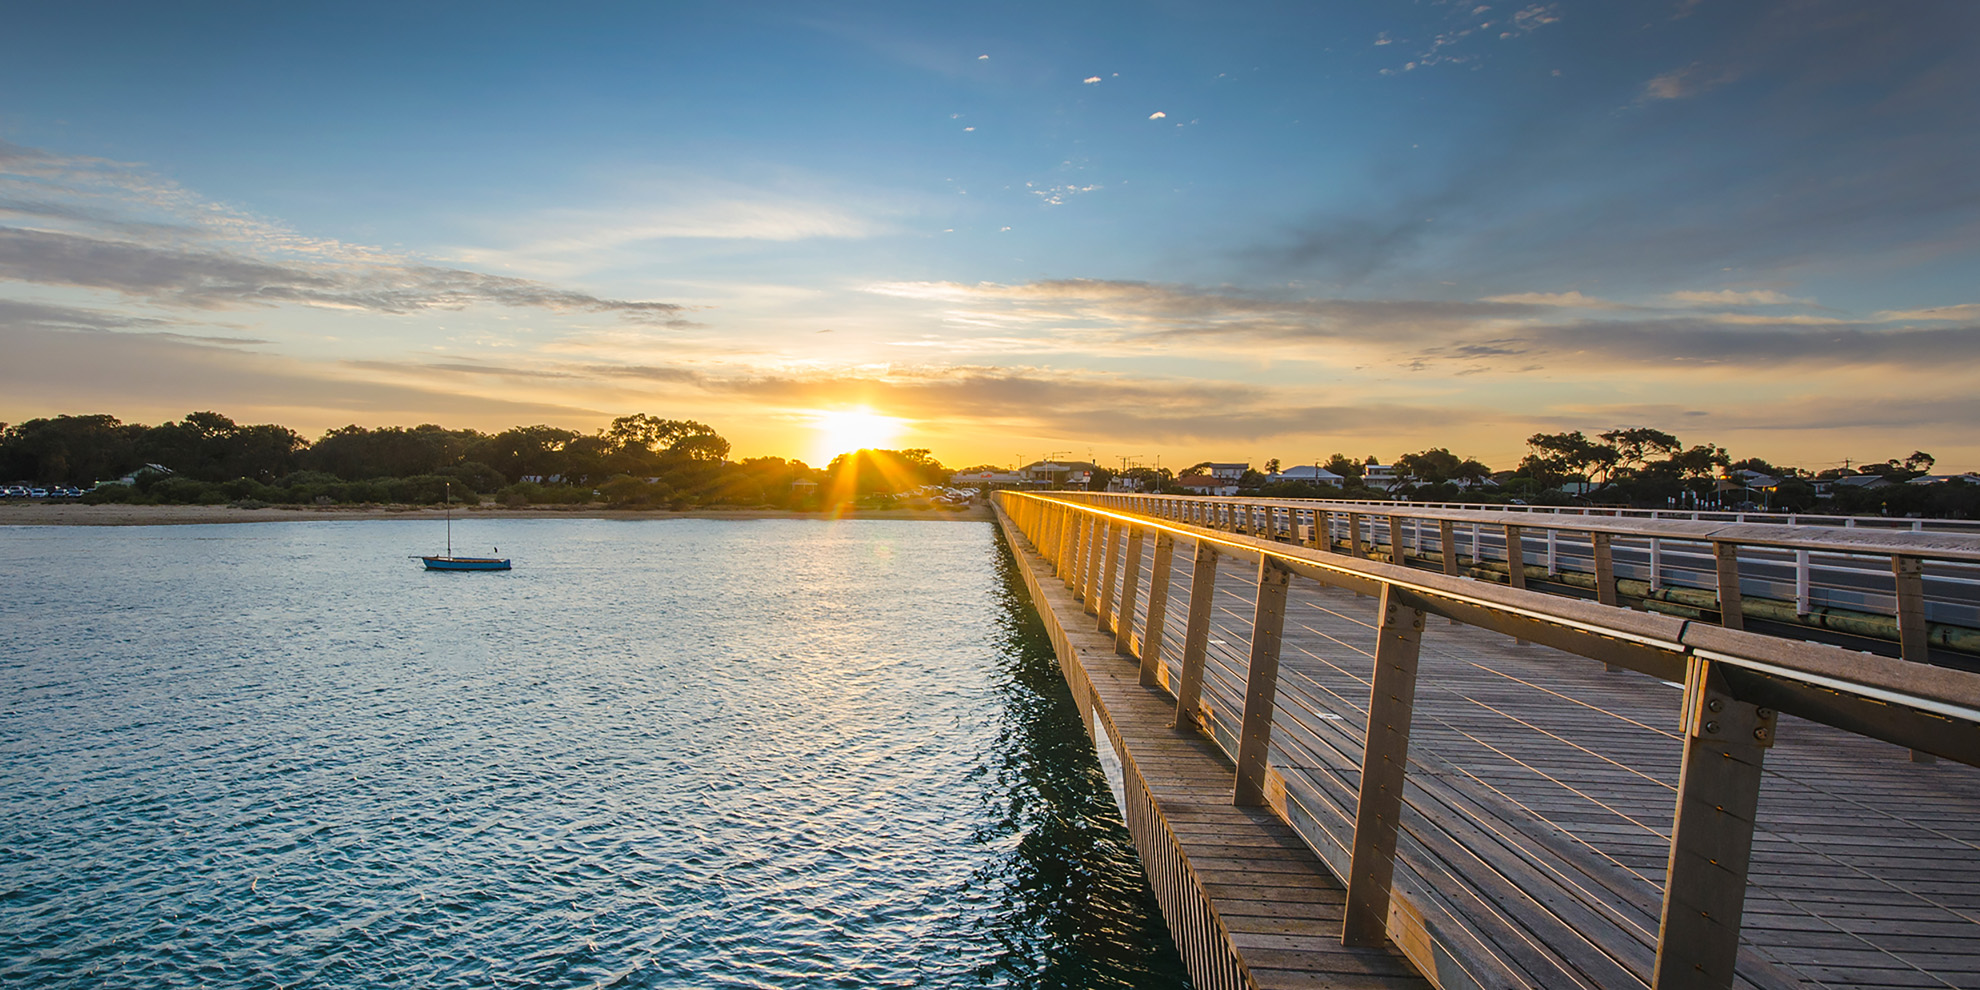 BH Bridge Summer Sunset 2